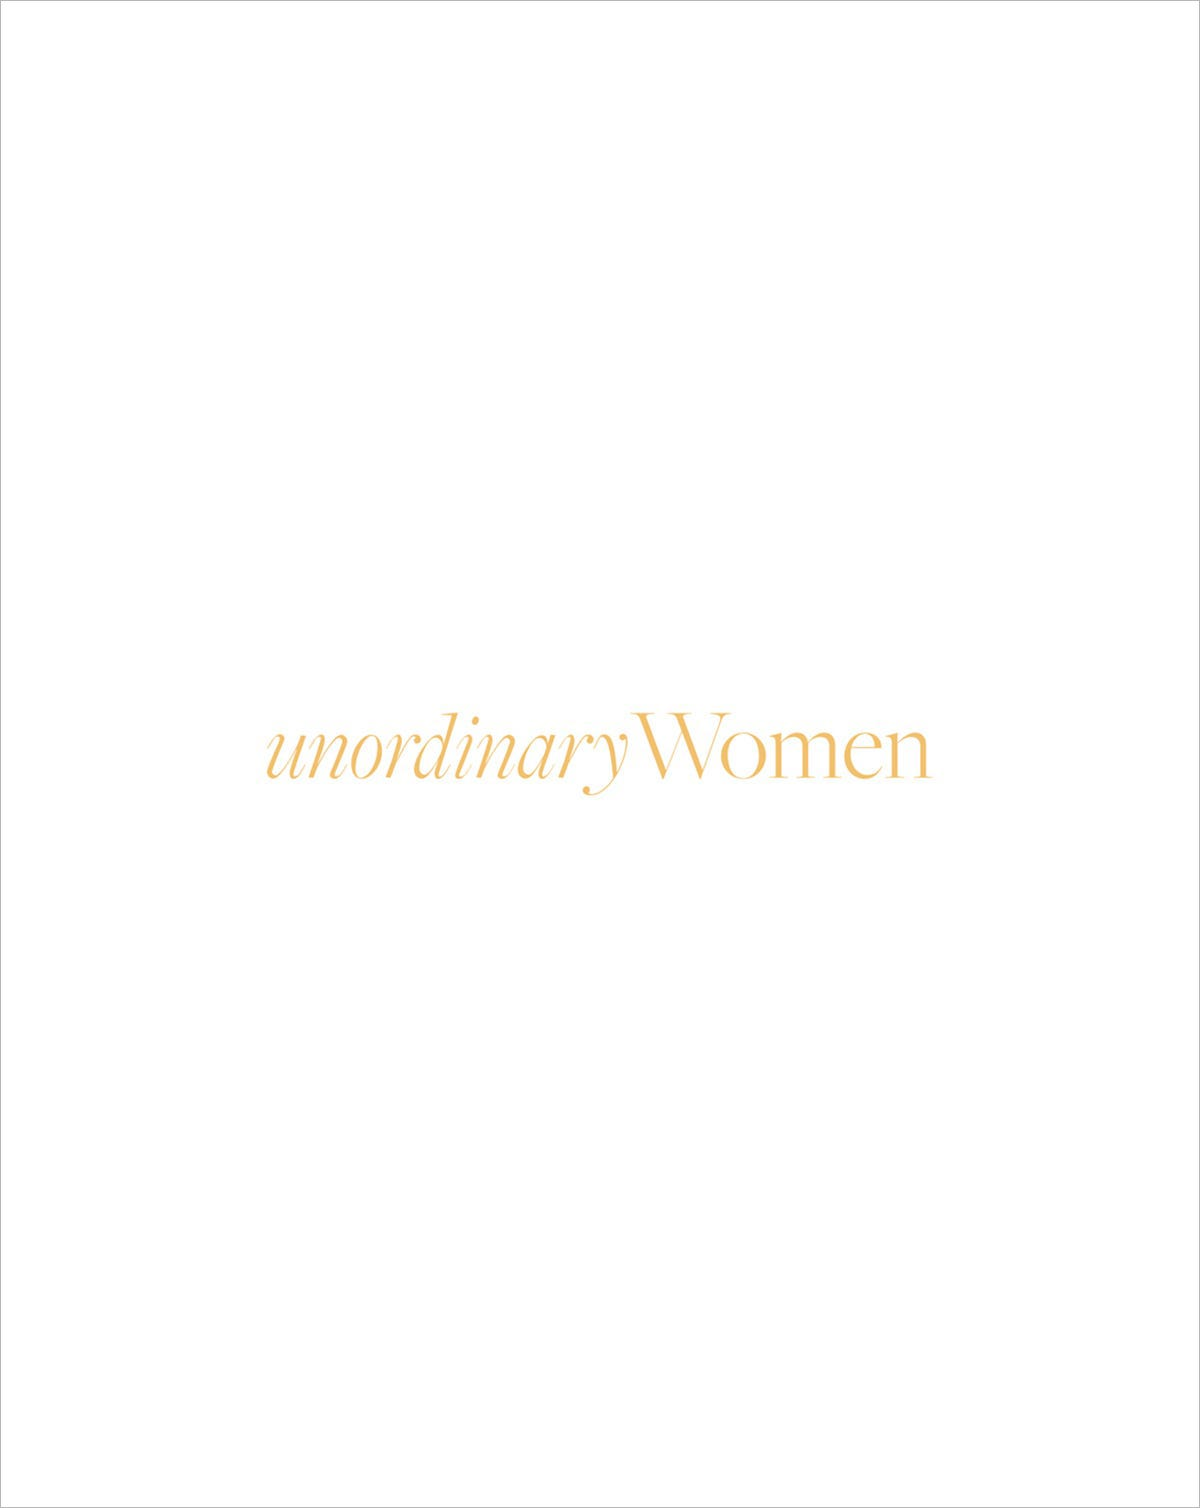 Unordinary Women Book